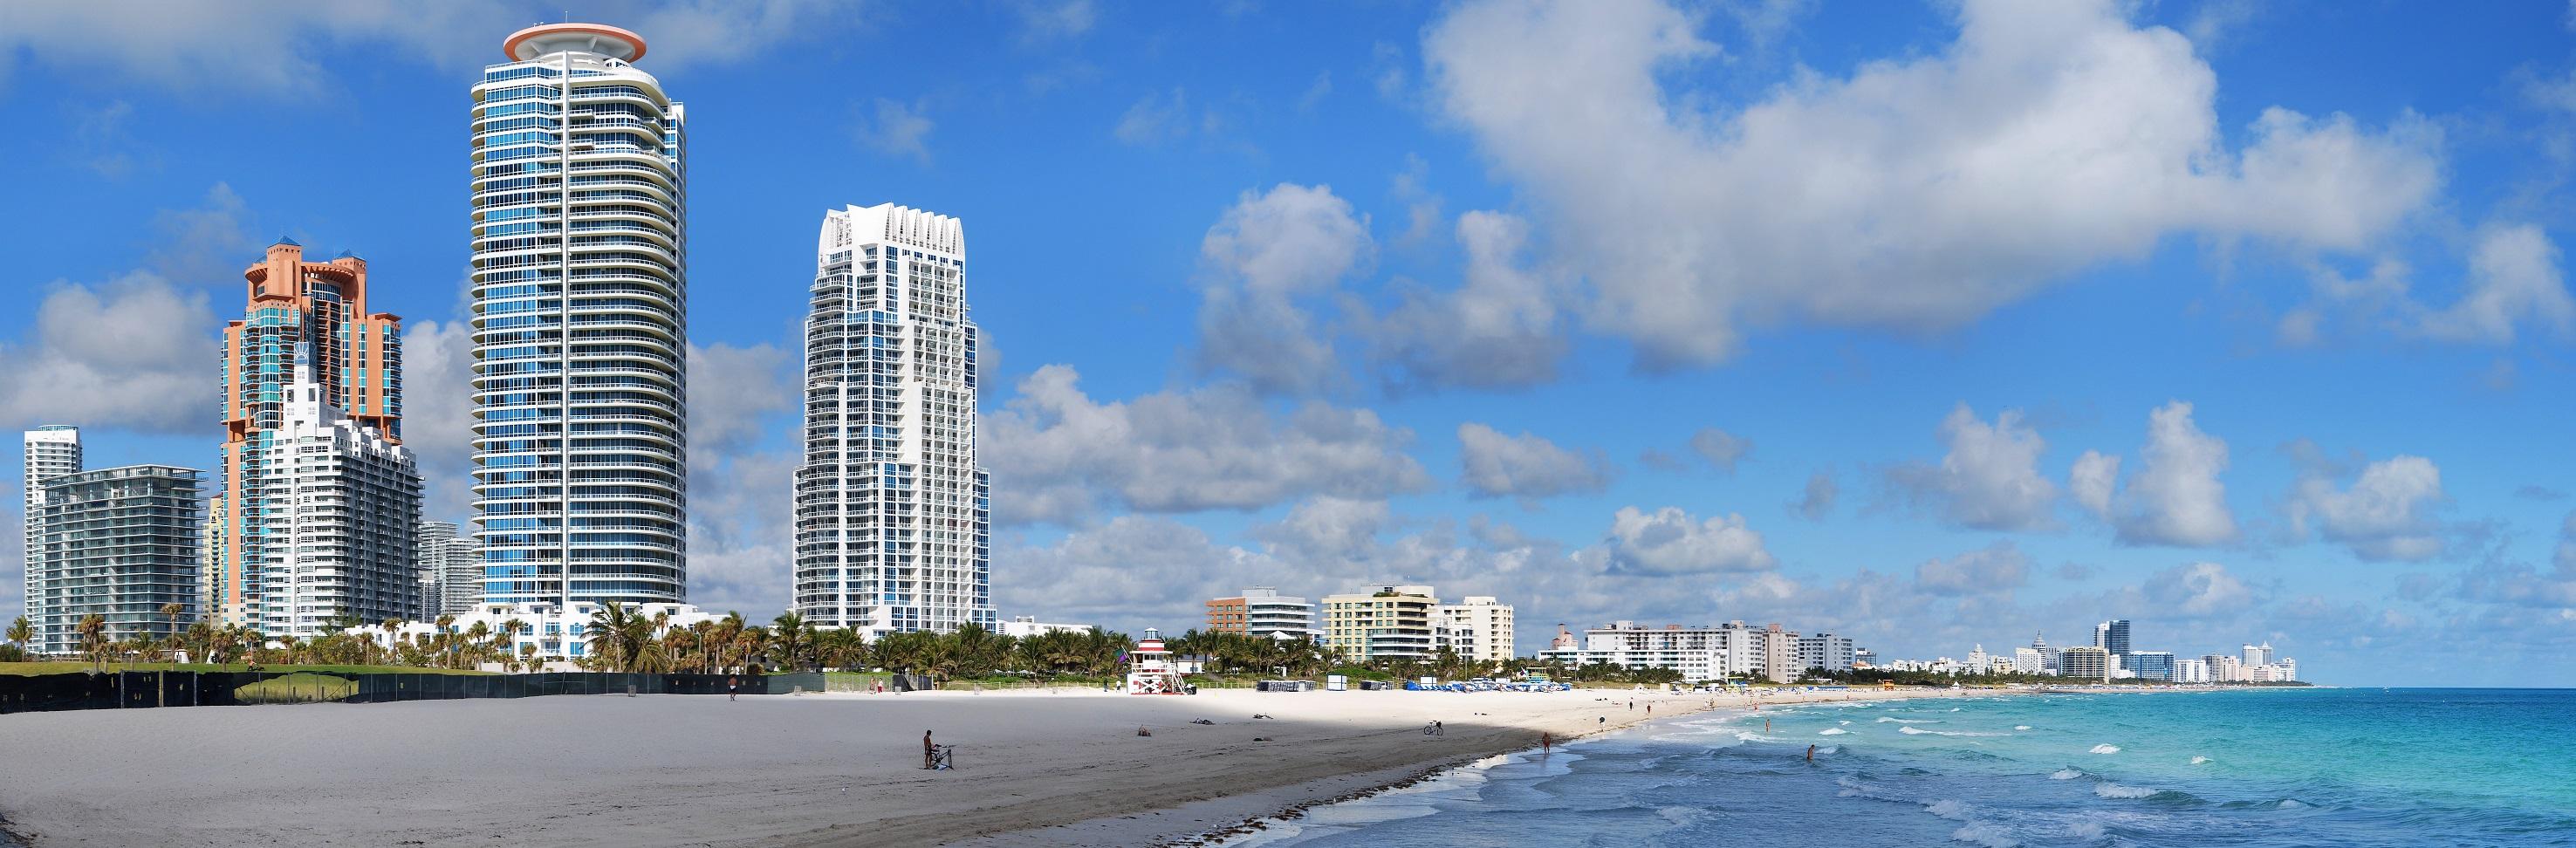 South Beach Real Estate: Miami Suburb Guide